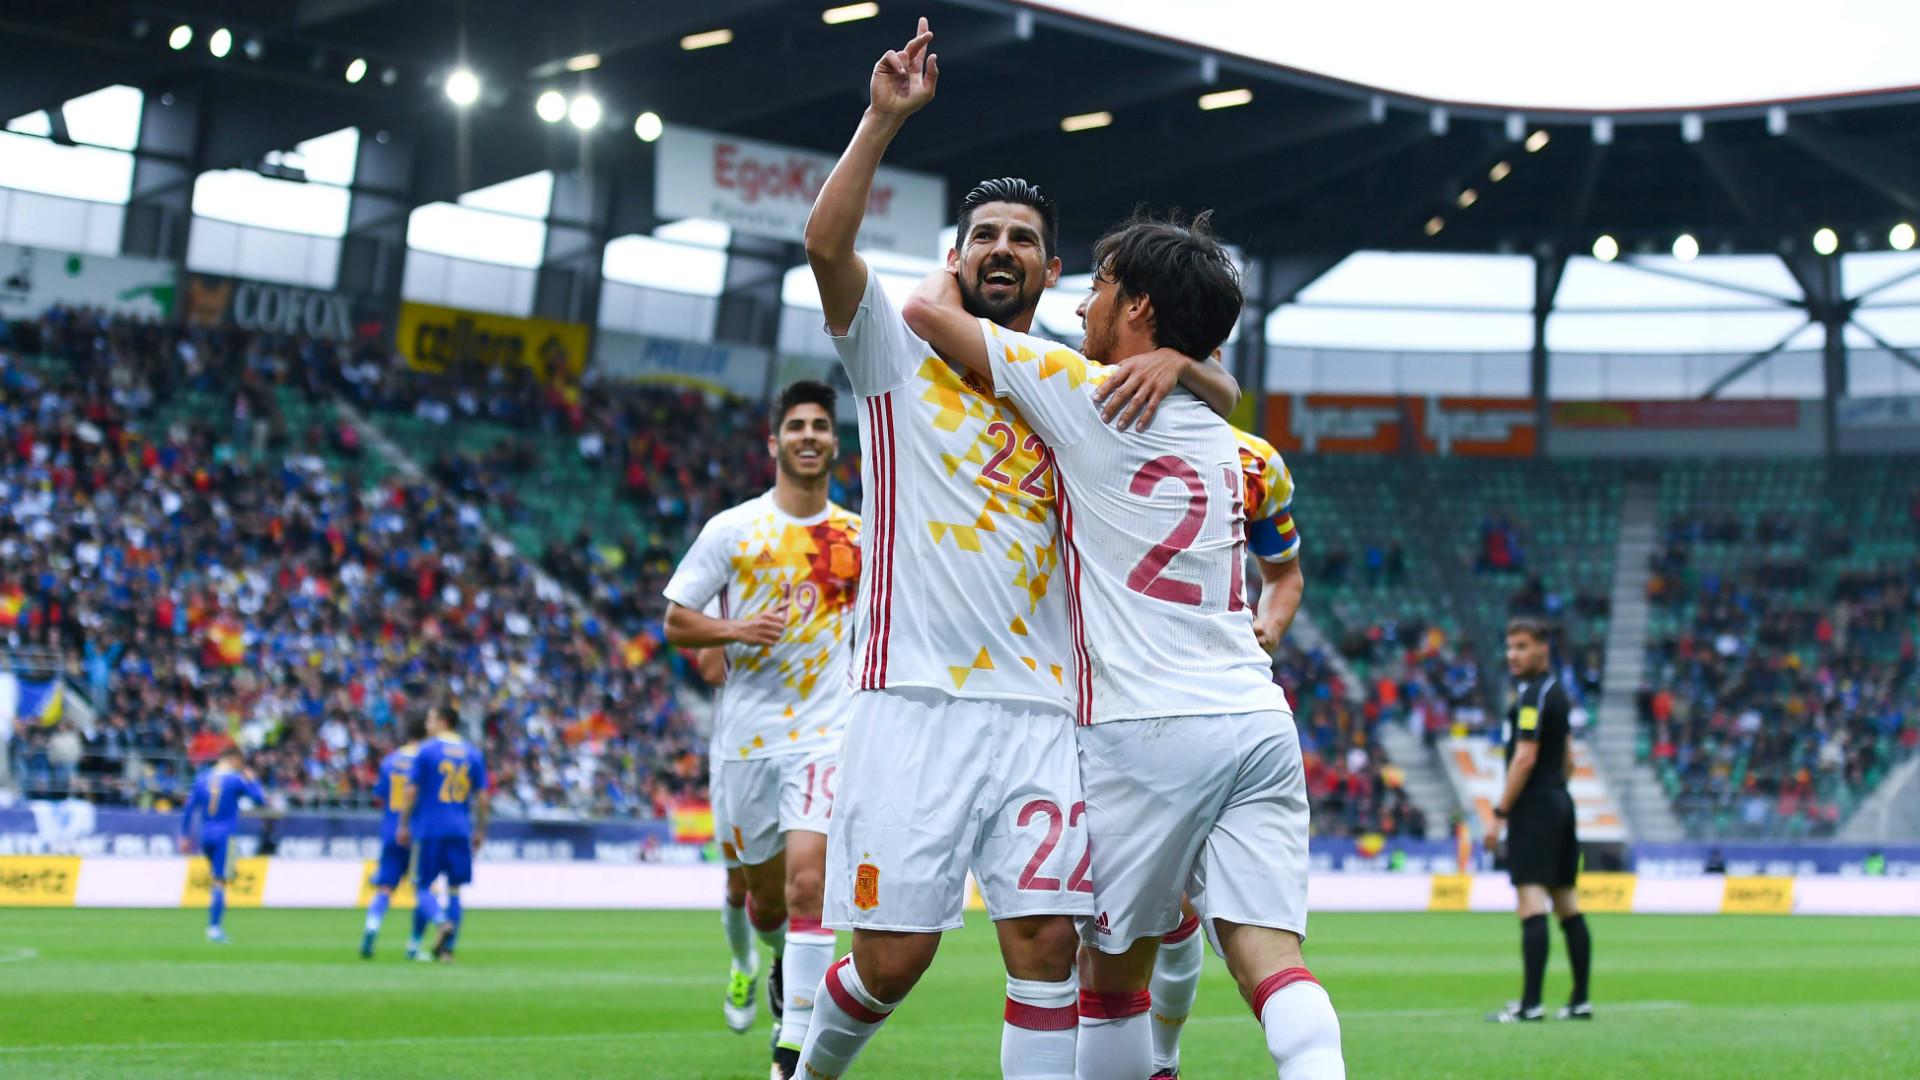 Image Result For Vivo Rusia Vs Espana En Vivo Match